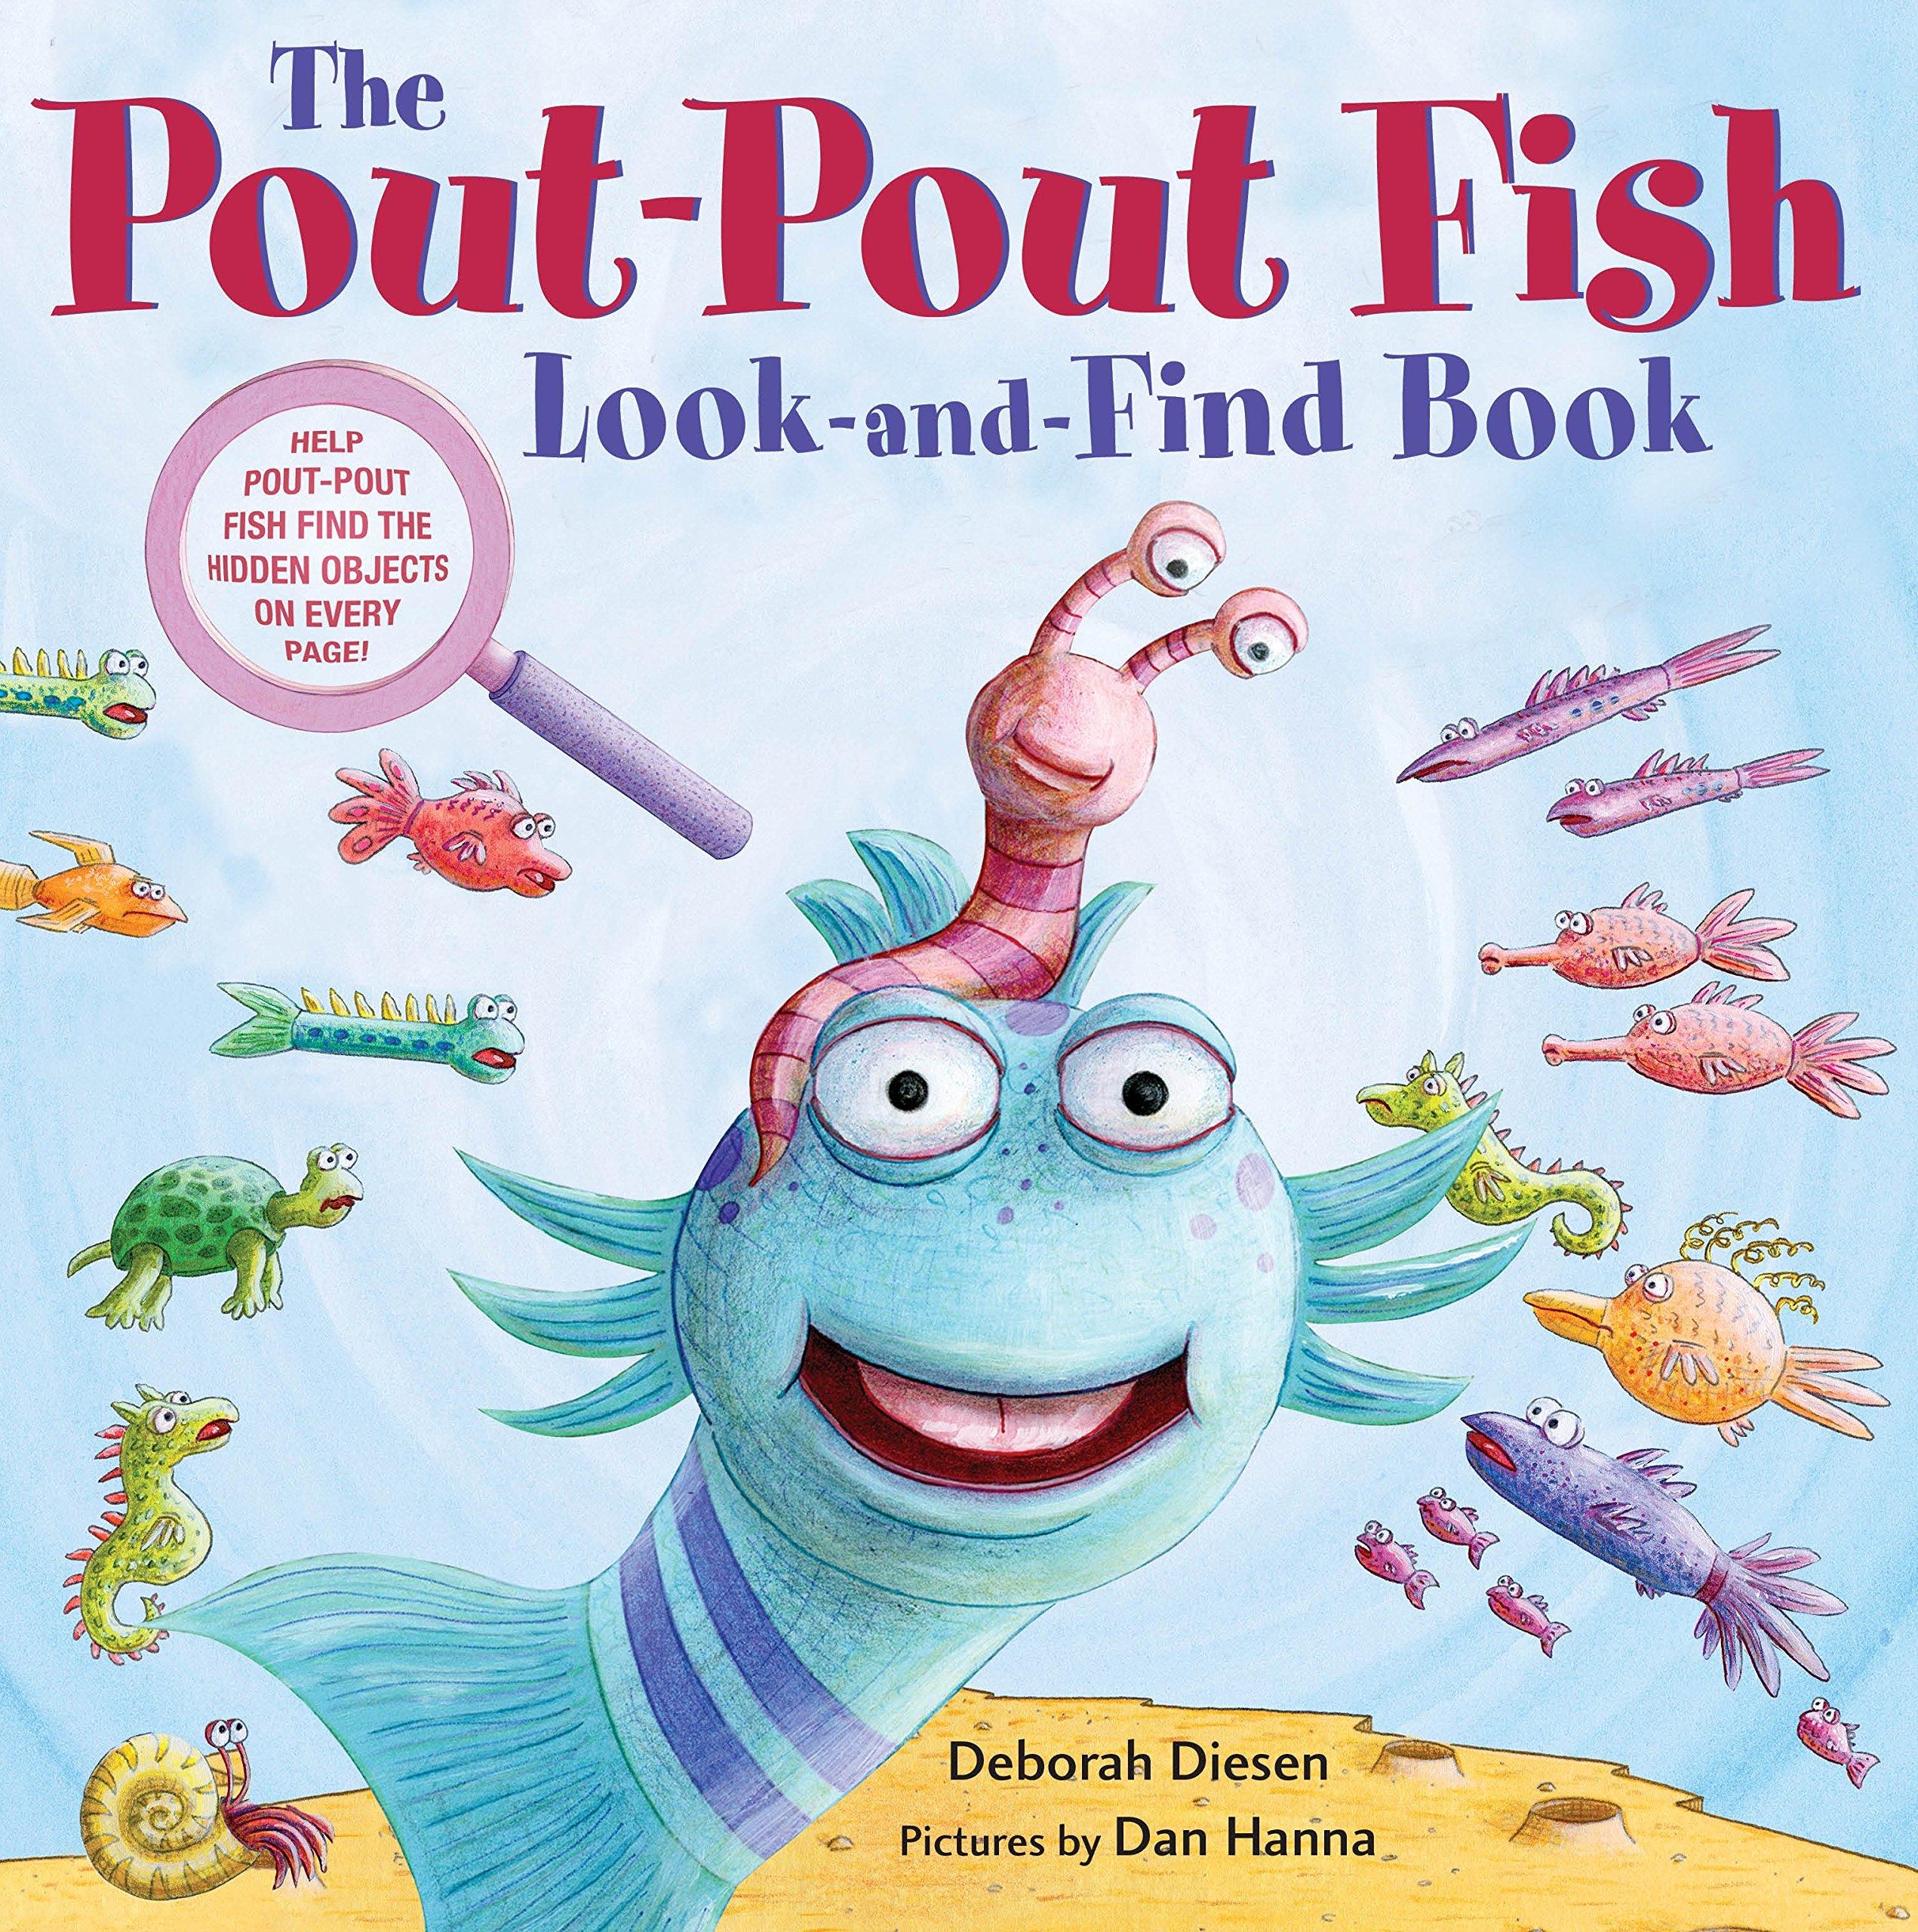 Download The Pout-Pout Fish Look-and-Find Book (A Pout-Pout Fish Novelty) pdf